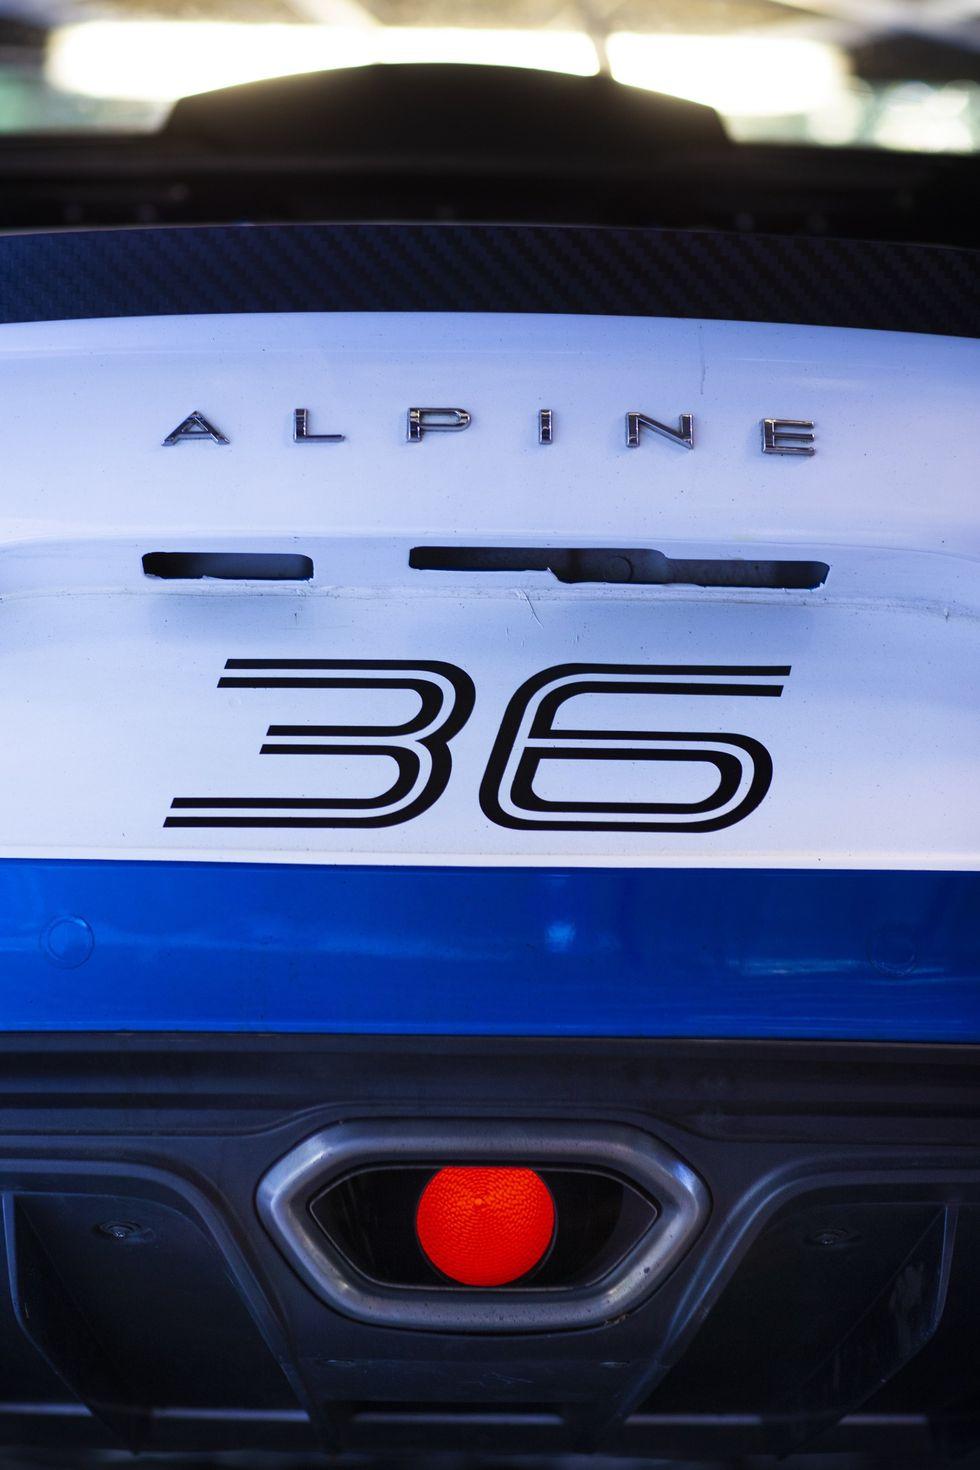 World Rally Championship: Temporada 2019 Vol. II - Página 2 21231338-2019-alpine-a110-rally-1567699014